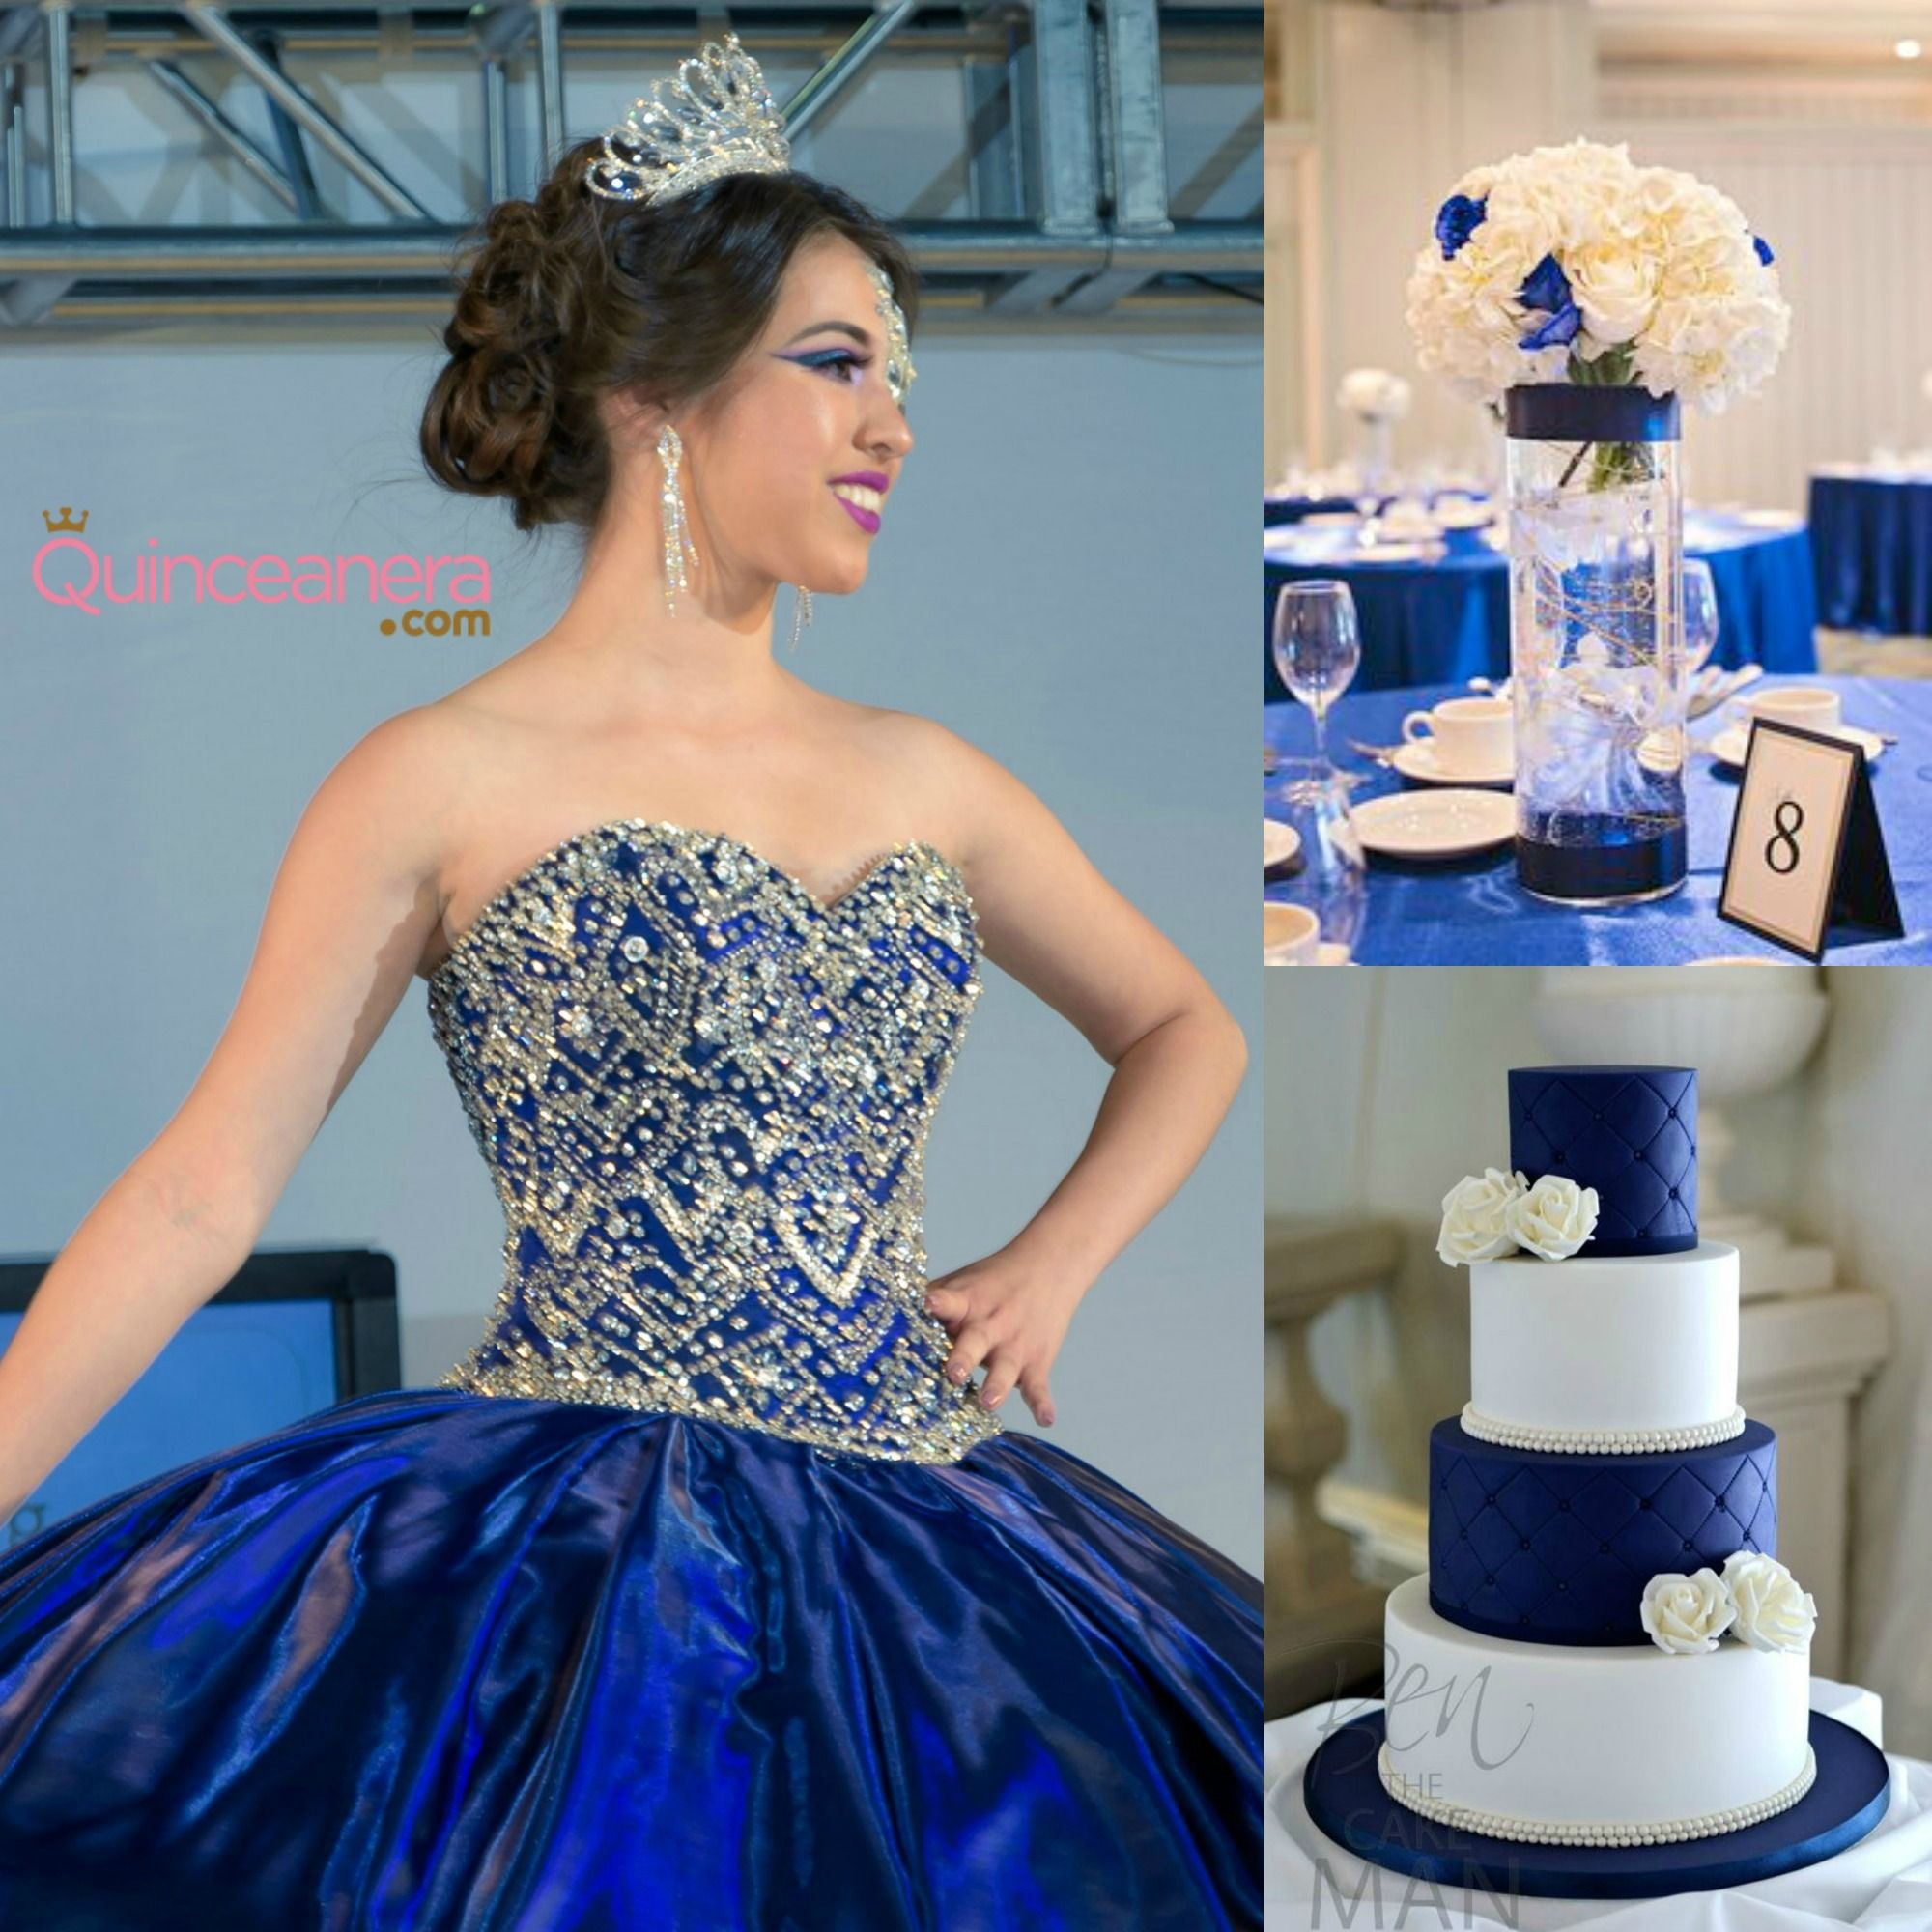 Quince Theme Decorations | Quince dresses, Quinceanera themes, Quinceanera decorations